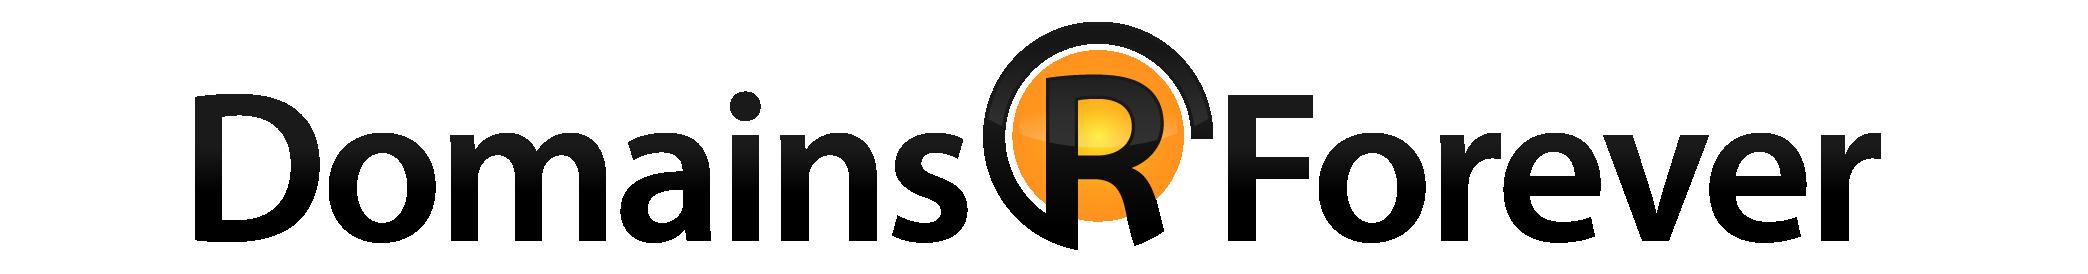 Domains R Forever